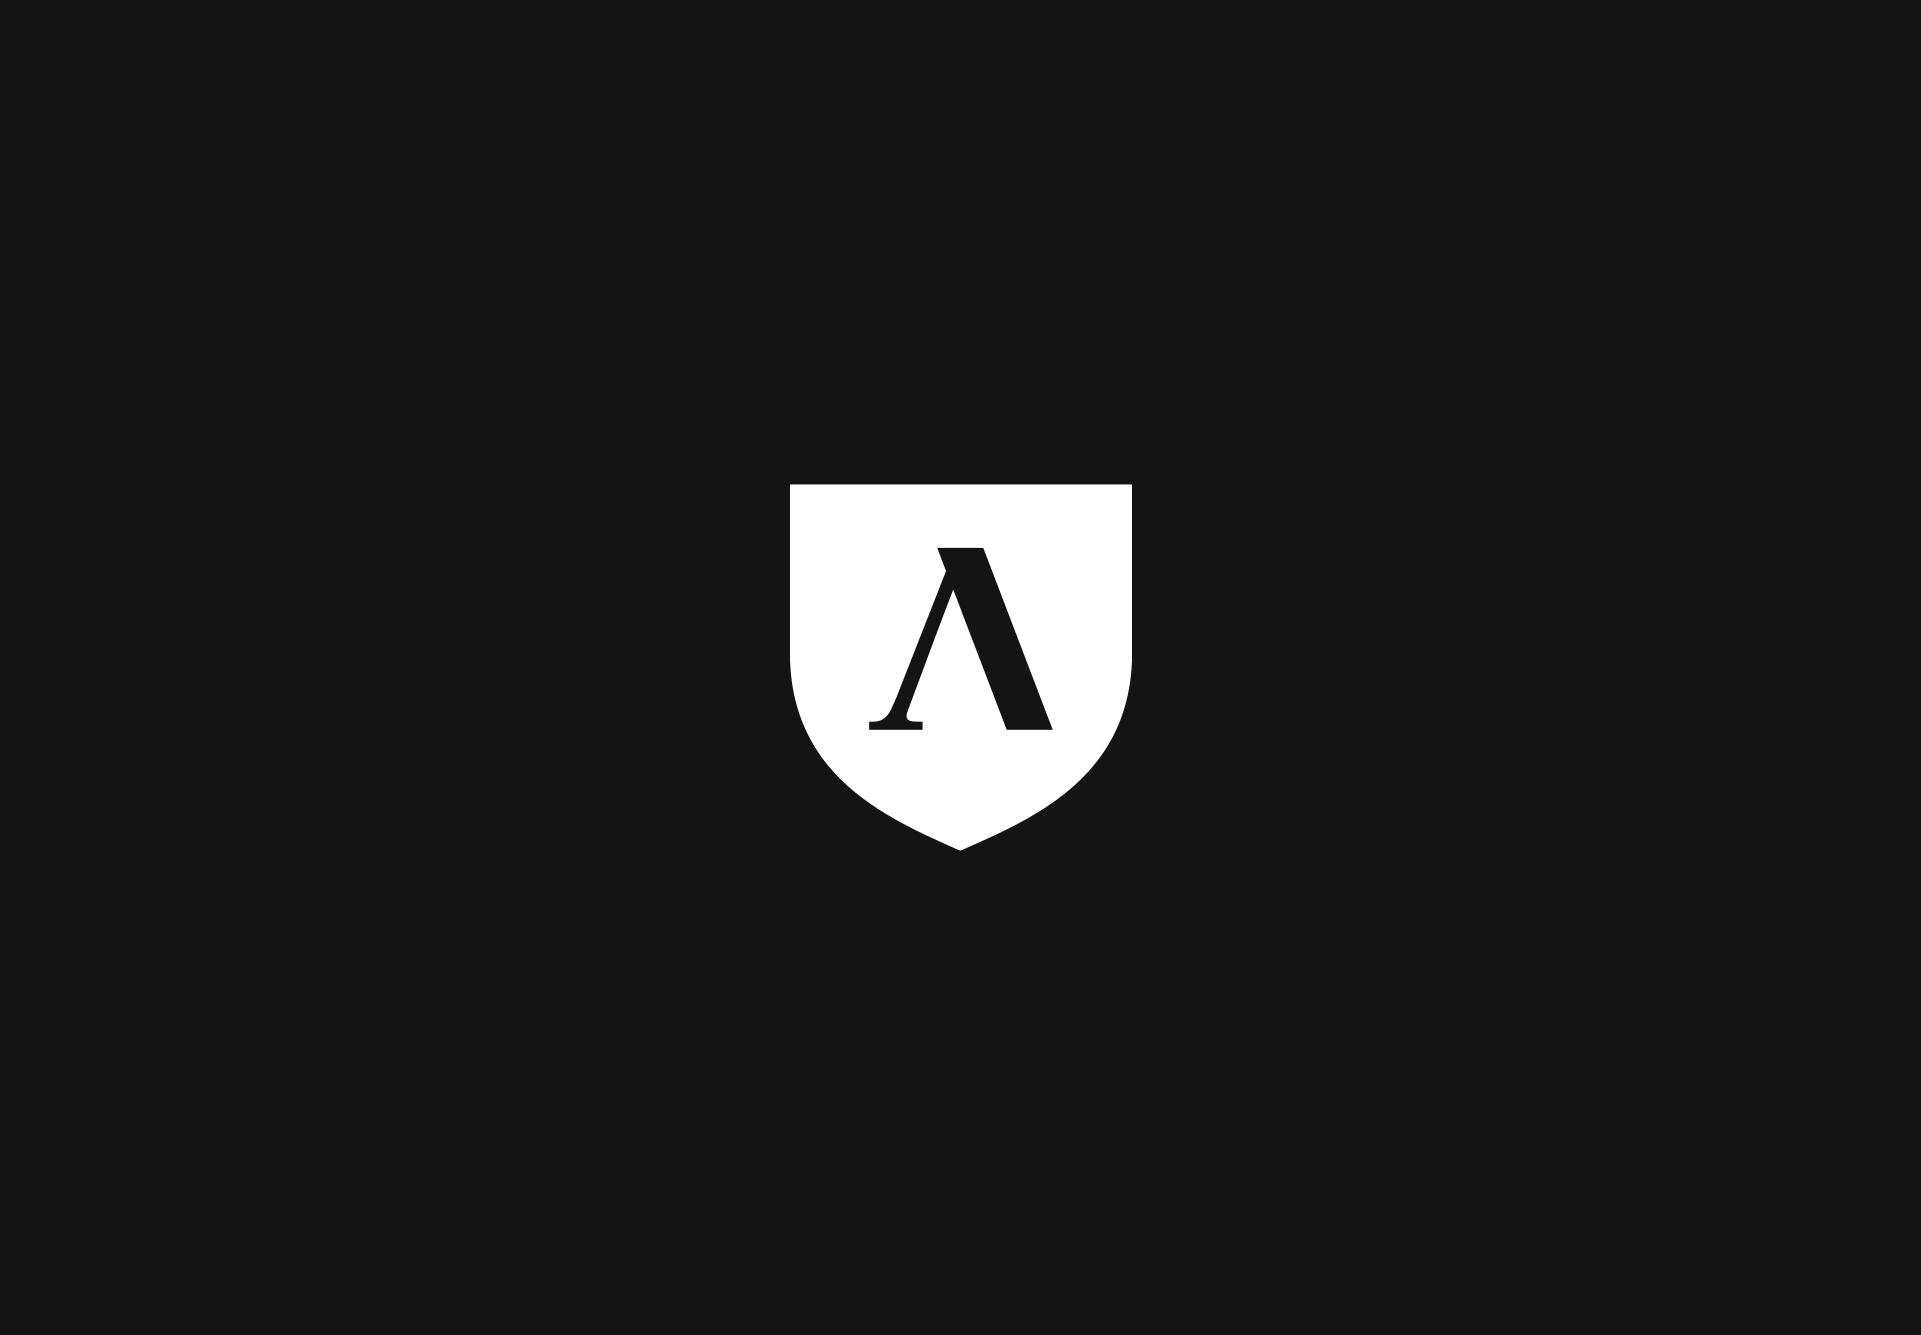 white lambda logo on black